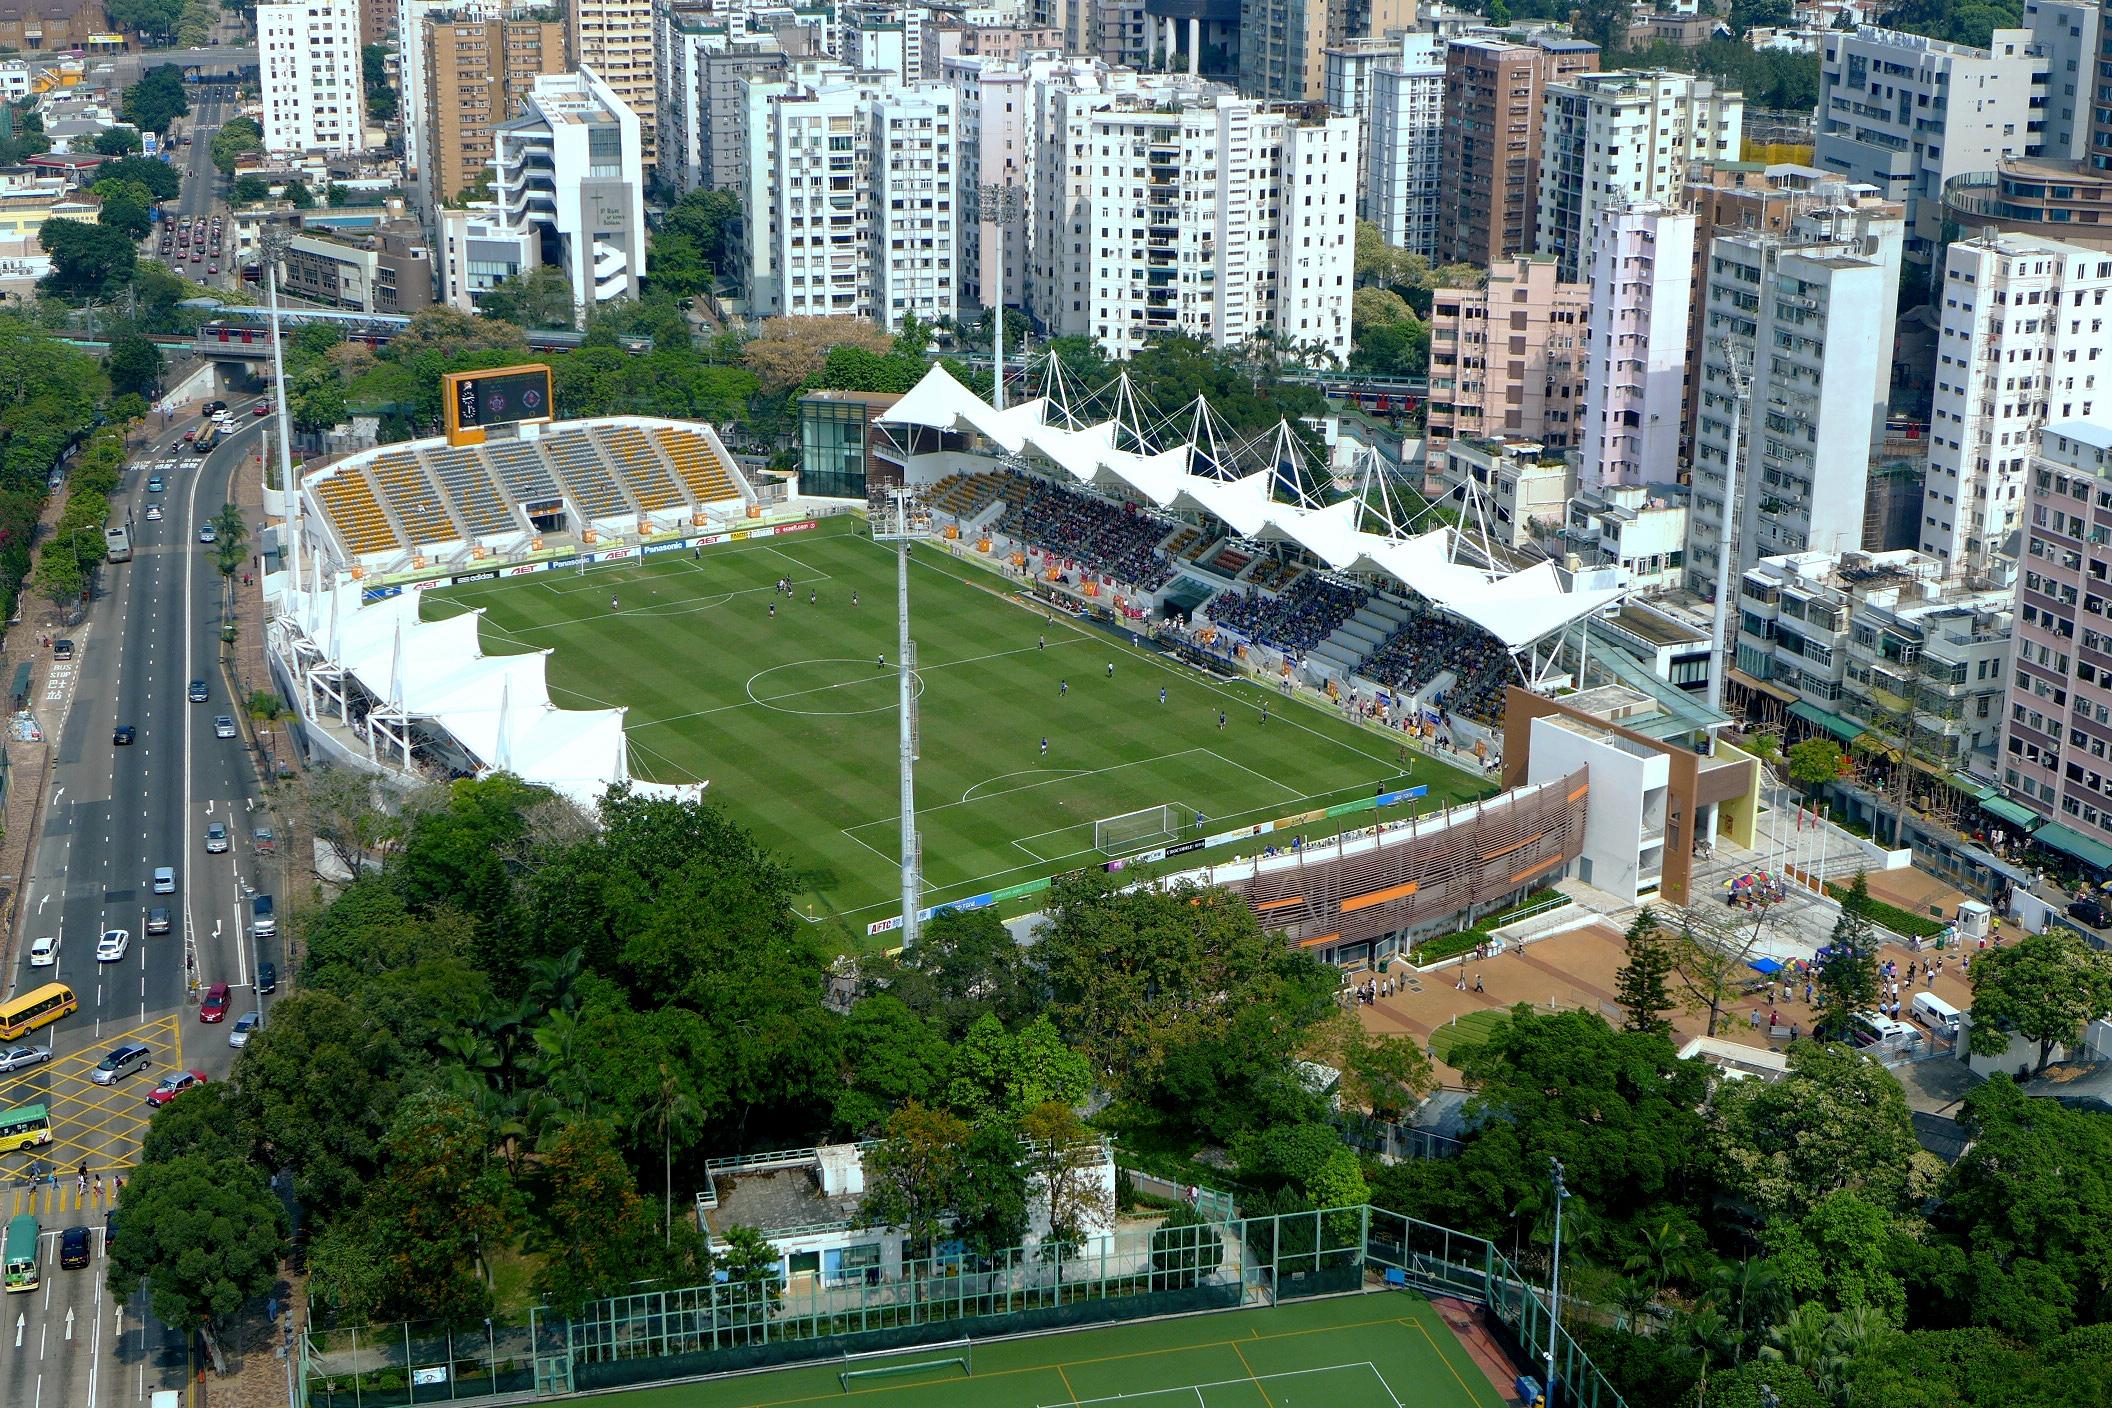 https://upload.wikimedia.org/wikipedia/commons/9/9f/Mong_Kok_Stadium_201504.jpg